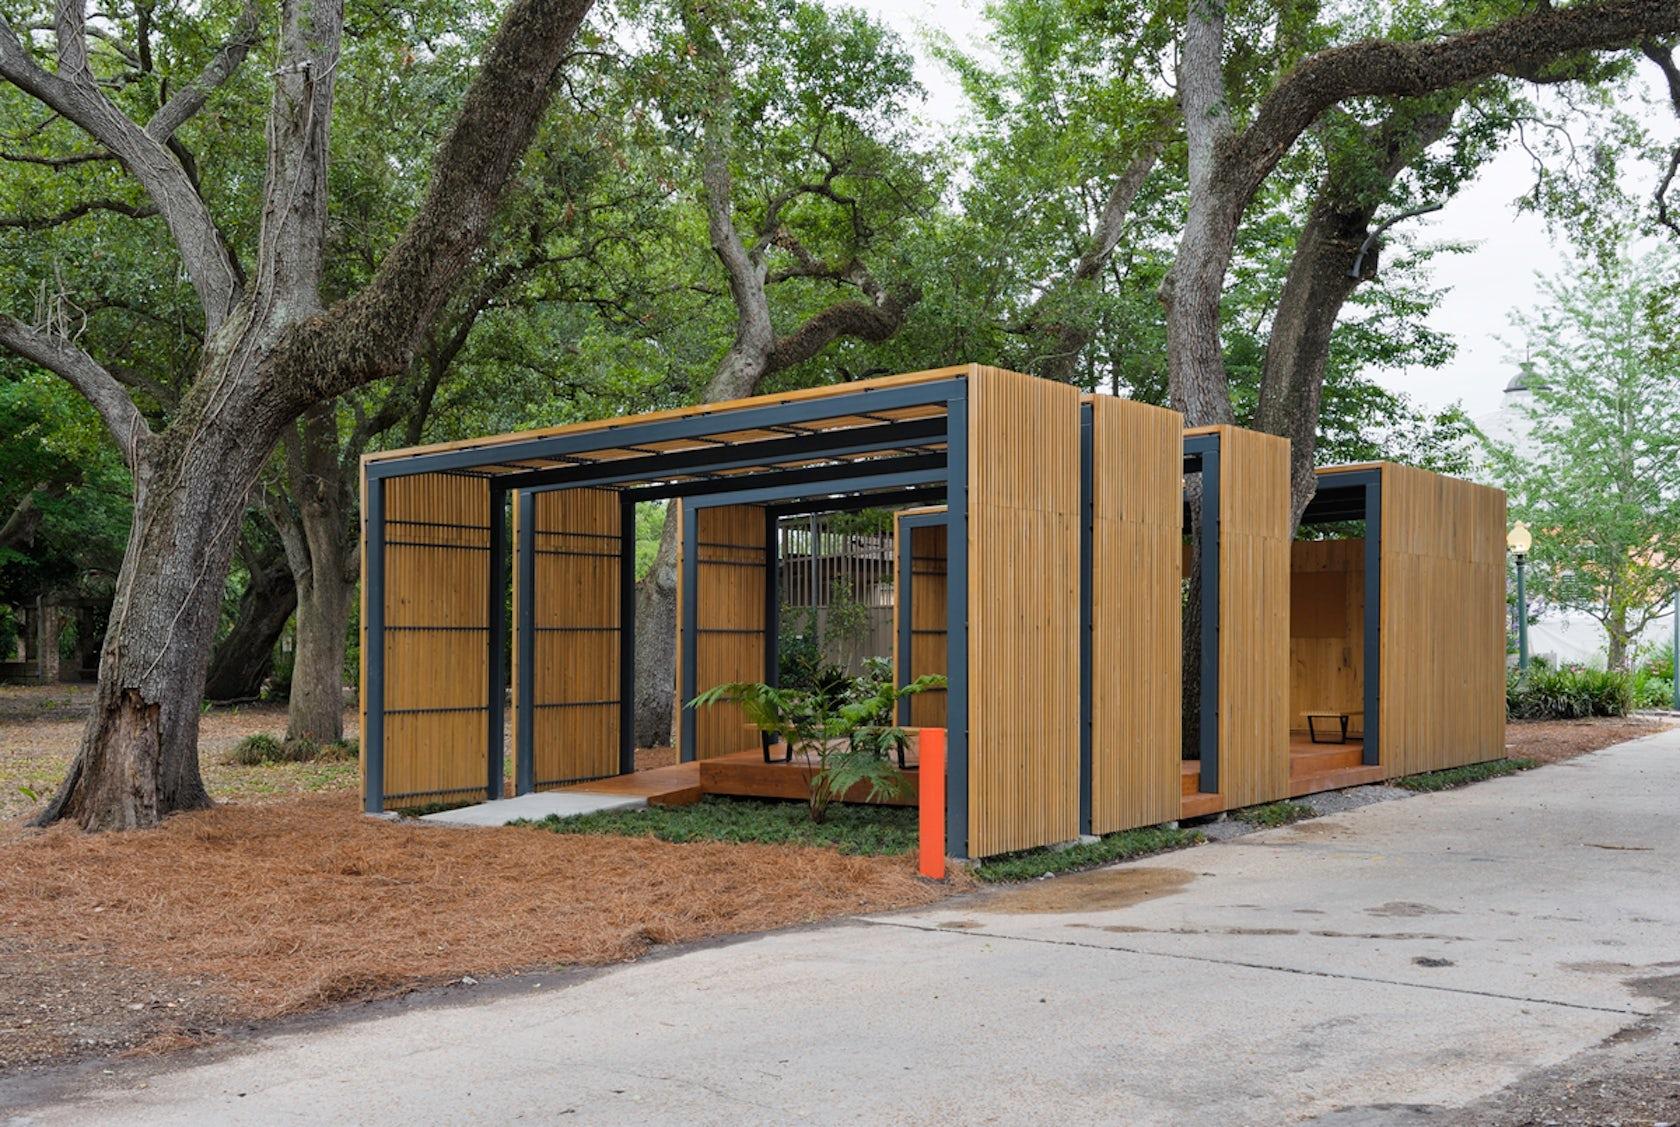 Duplantier Volunteer Pavilion Architizer